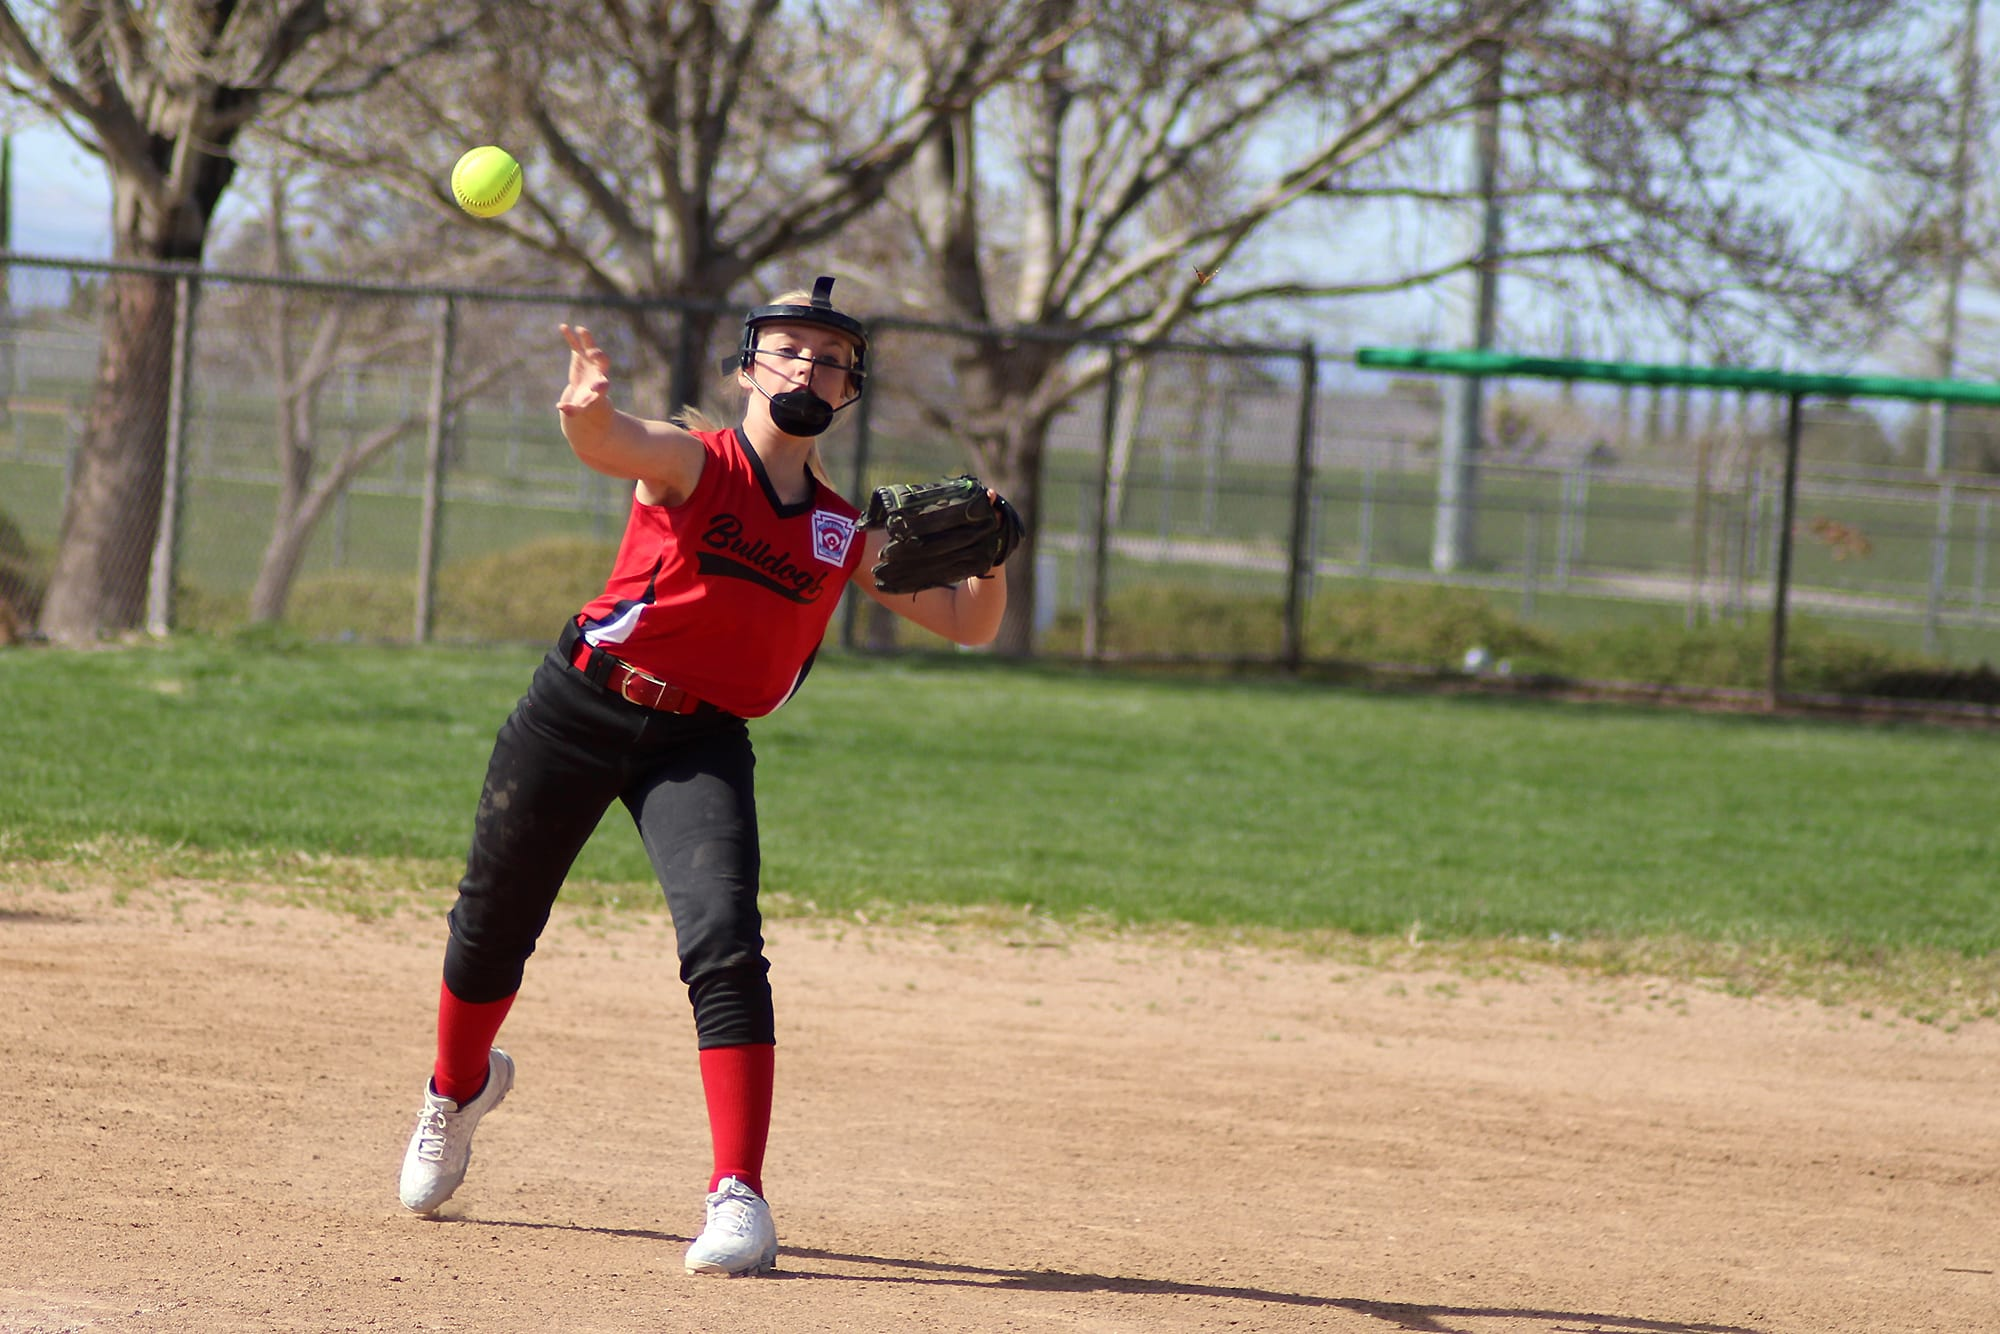 sb-fielder-throwing-ball